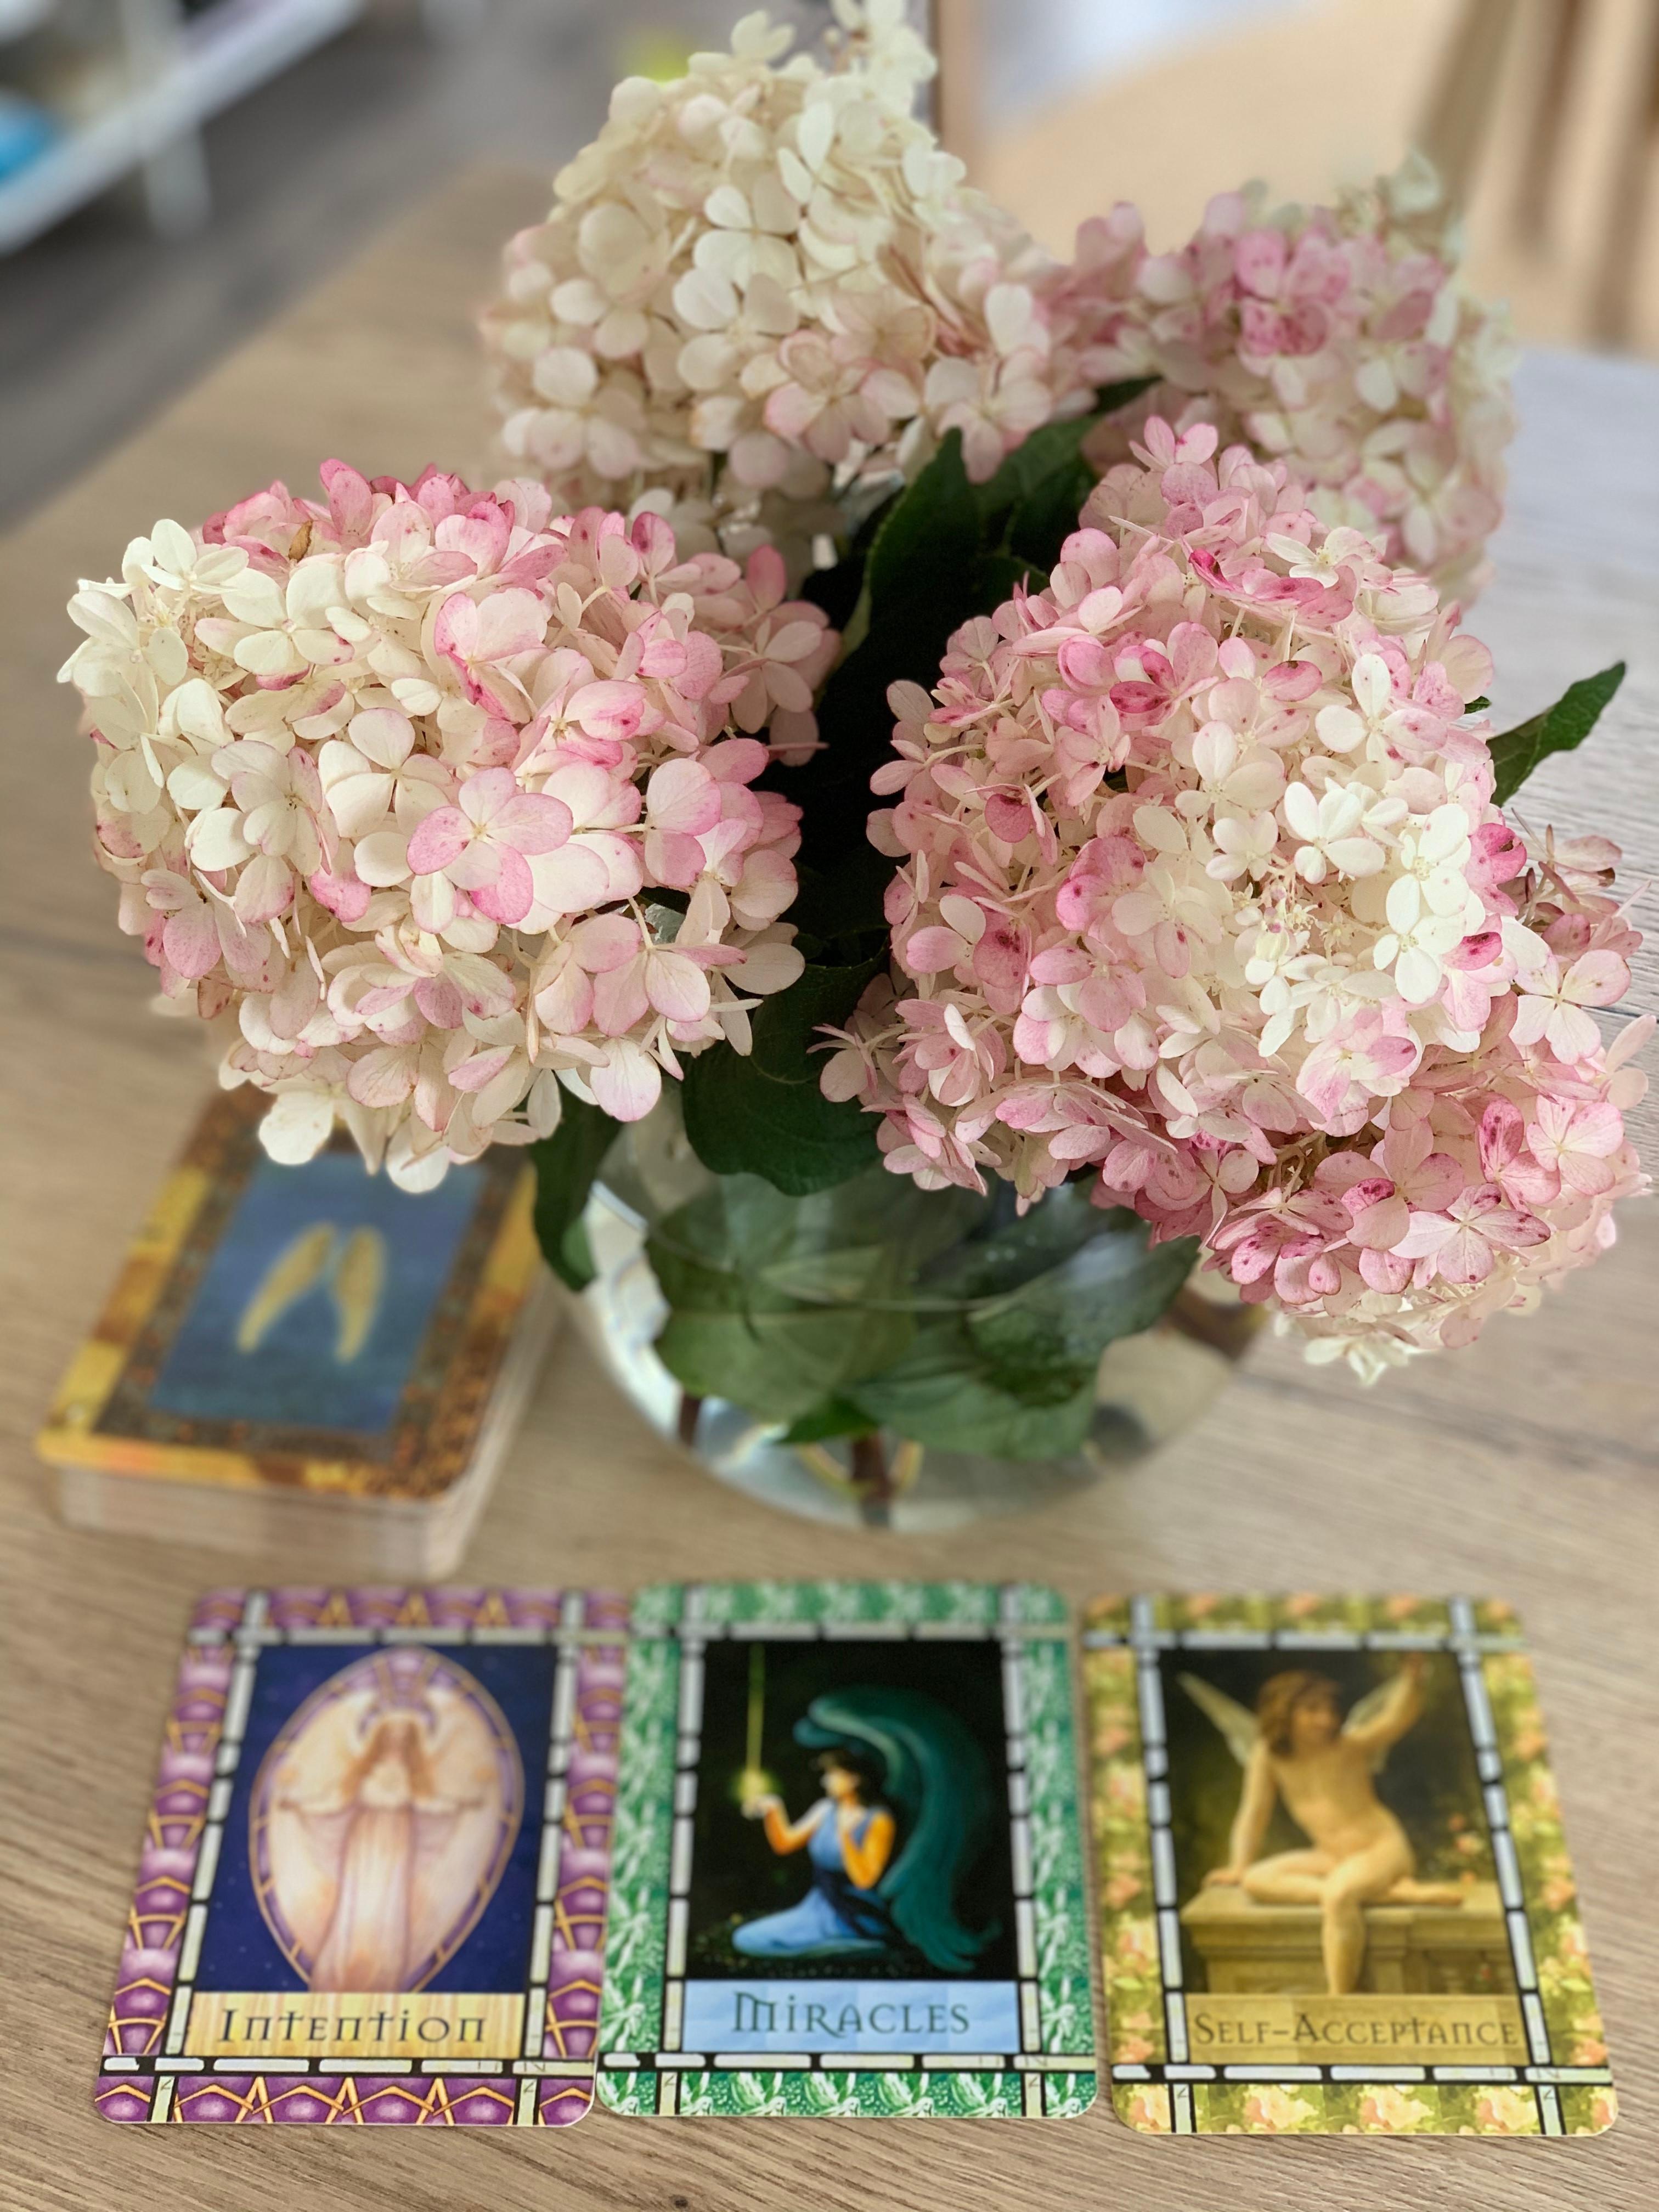 Three Card Guidance